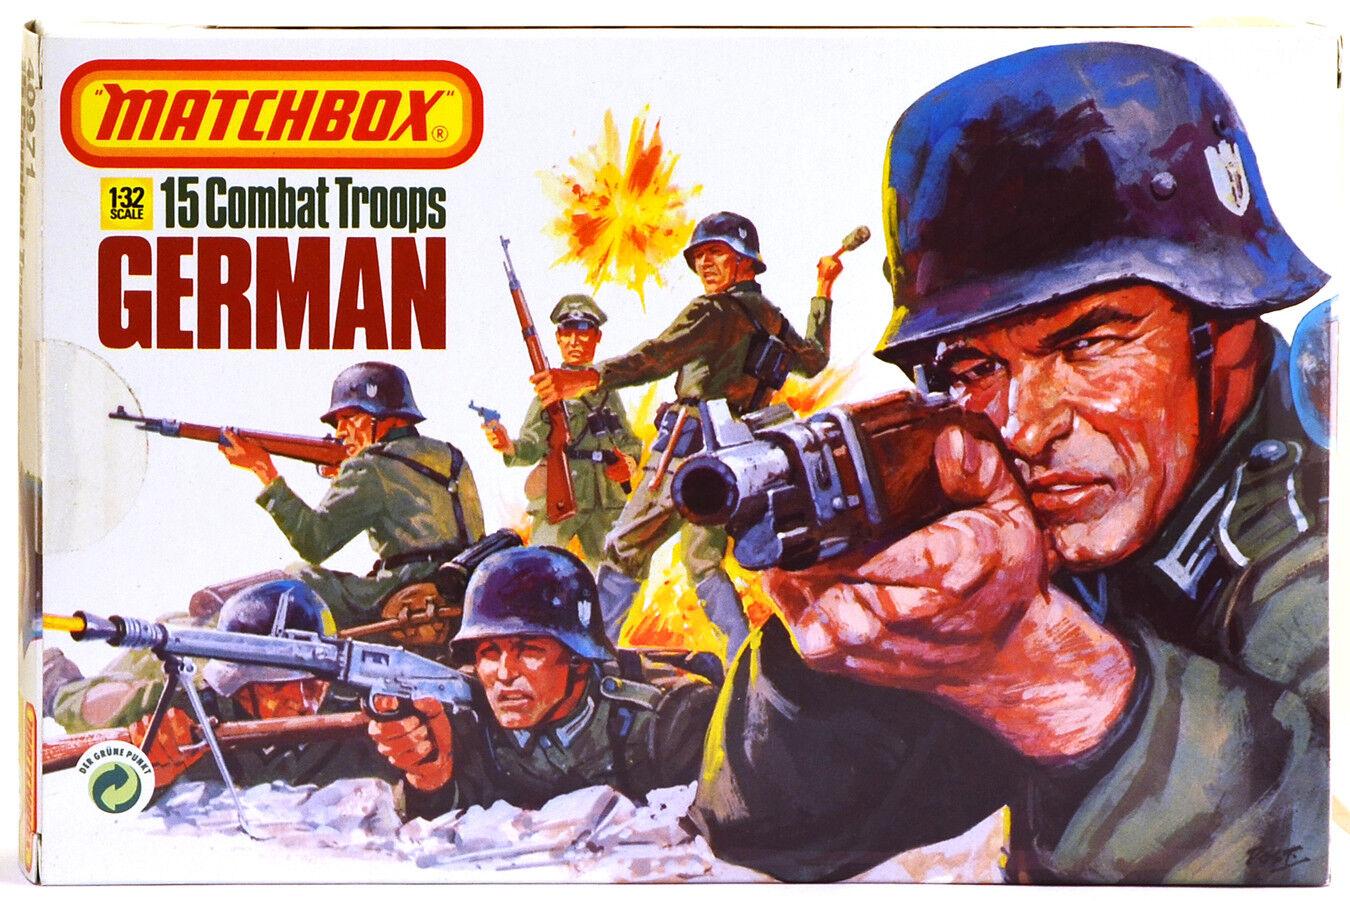 1983 Original Matchbox WWII German Infantry - 15 54mm figures - mib